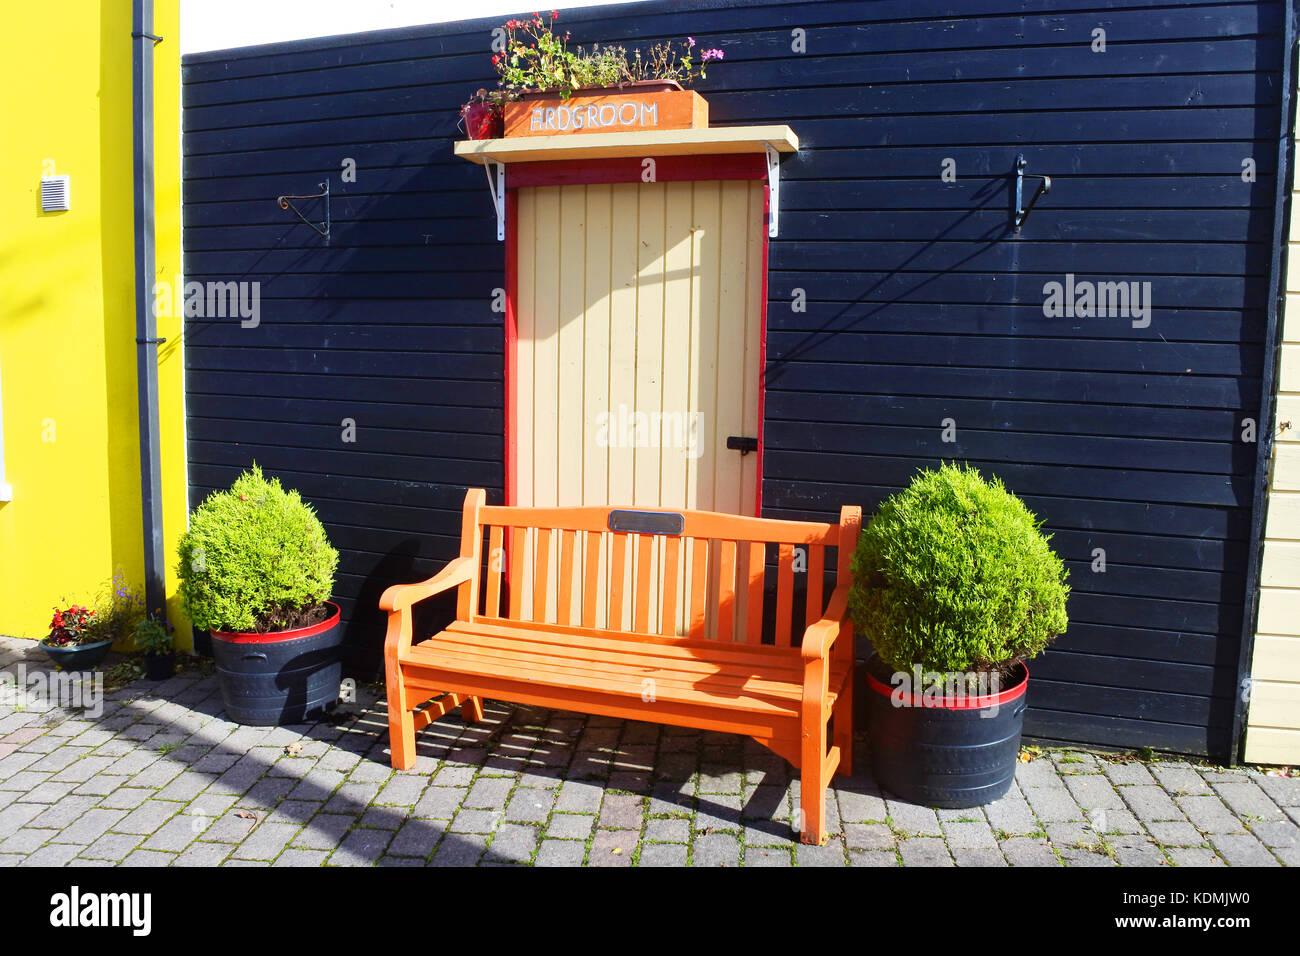 Street Furniture, Ardgroom, Ireland - John Gollop - Stock Image